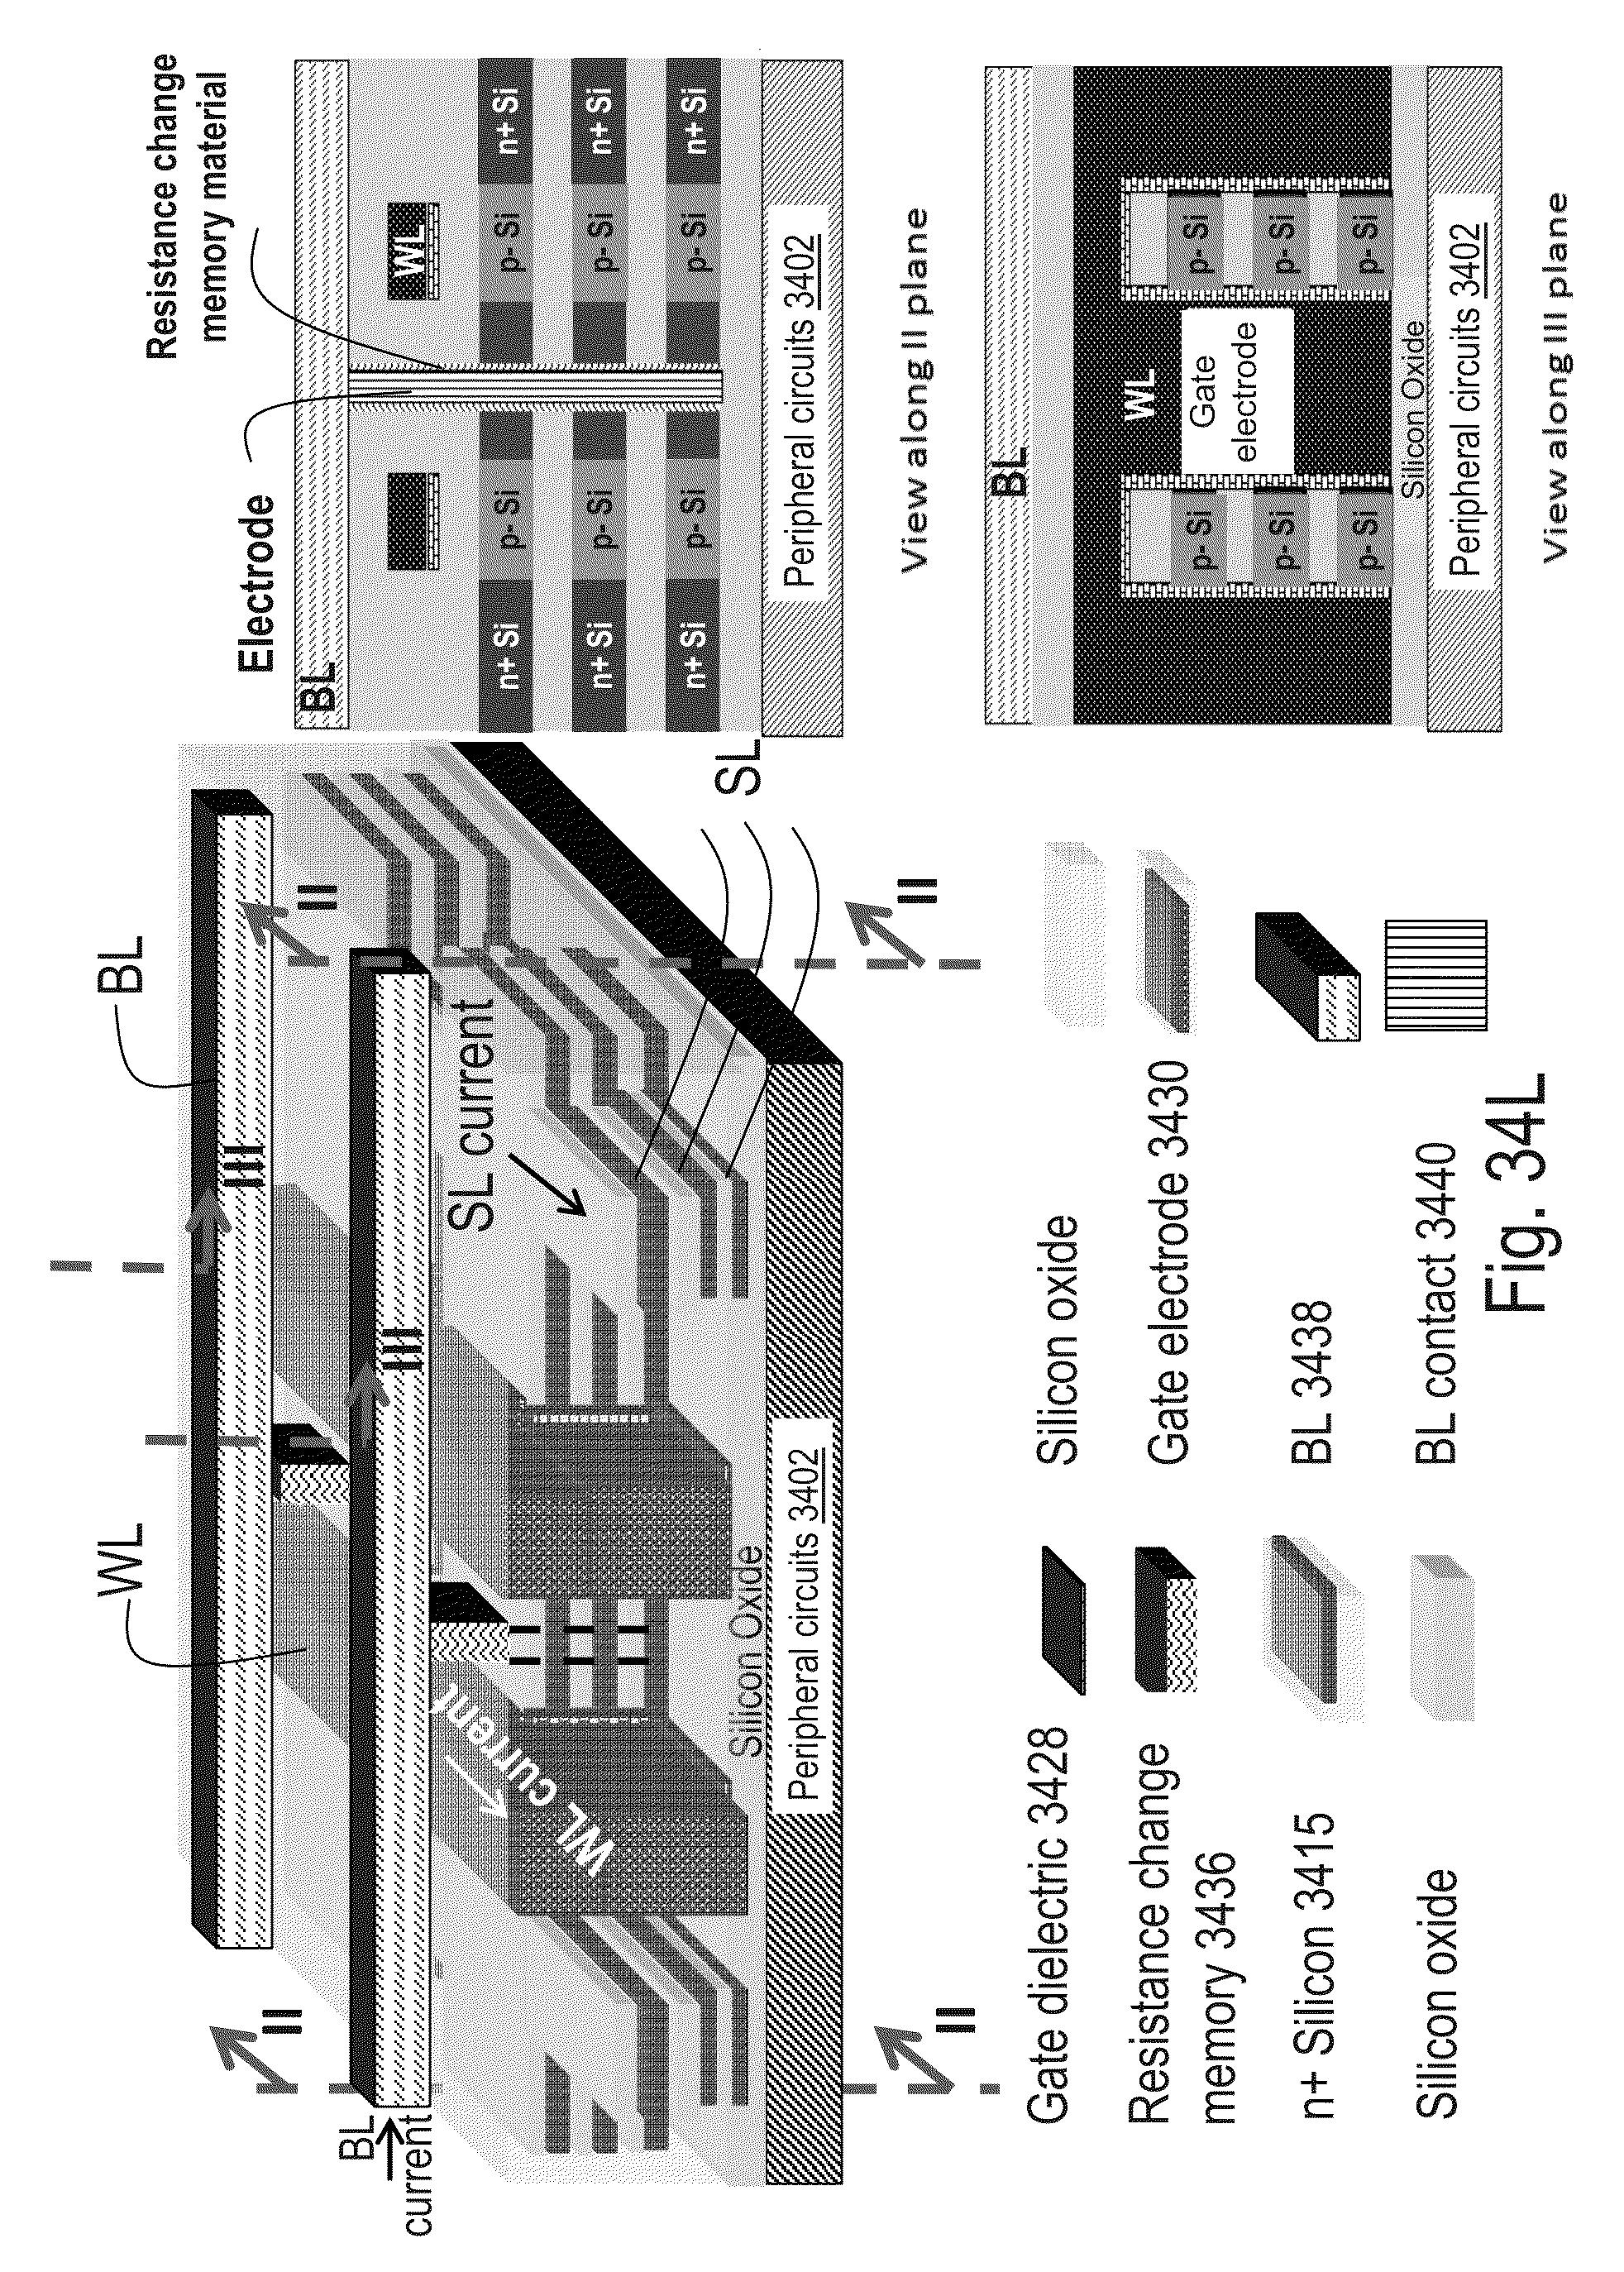 Patent Us 9219005 B2 Unipolar Stepper Motor Circuit Ennanoteccom Steppermotor Images